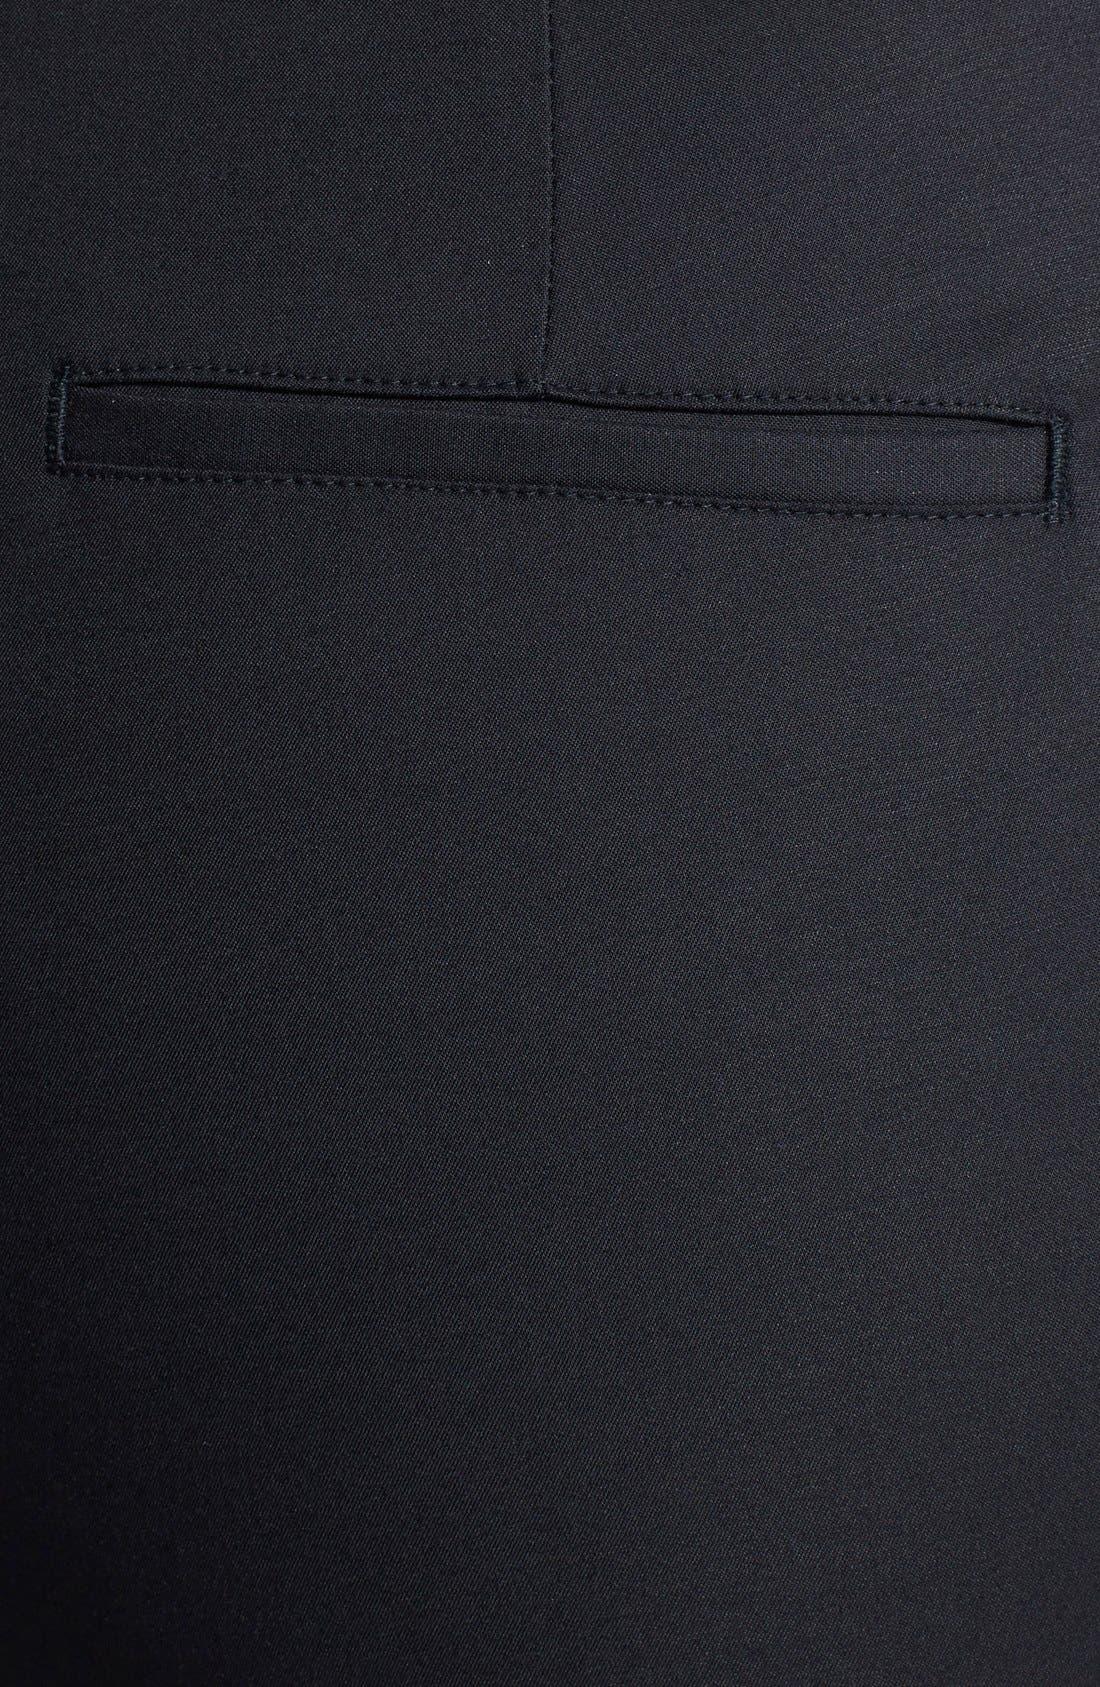 'The Perfect' Pants,                             Alternate thumbnail 3, color,                             Black Onyx